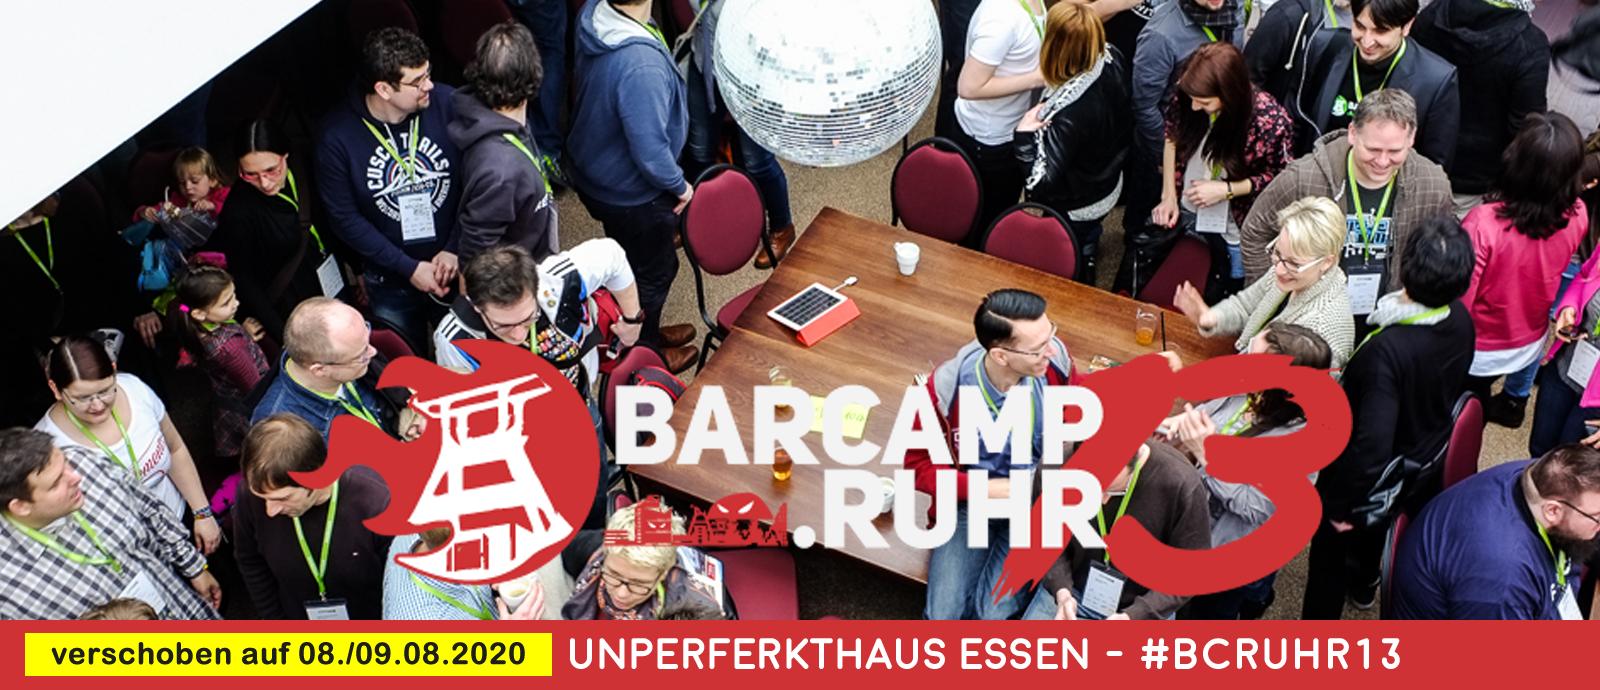 barcamp Ruhr 13